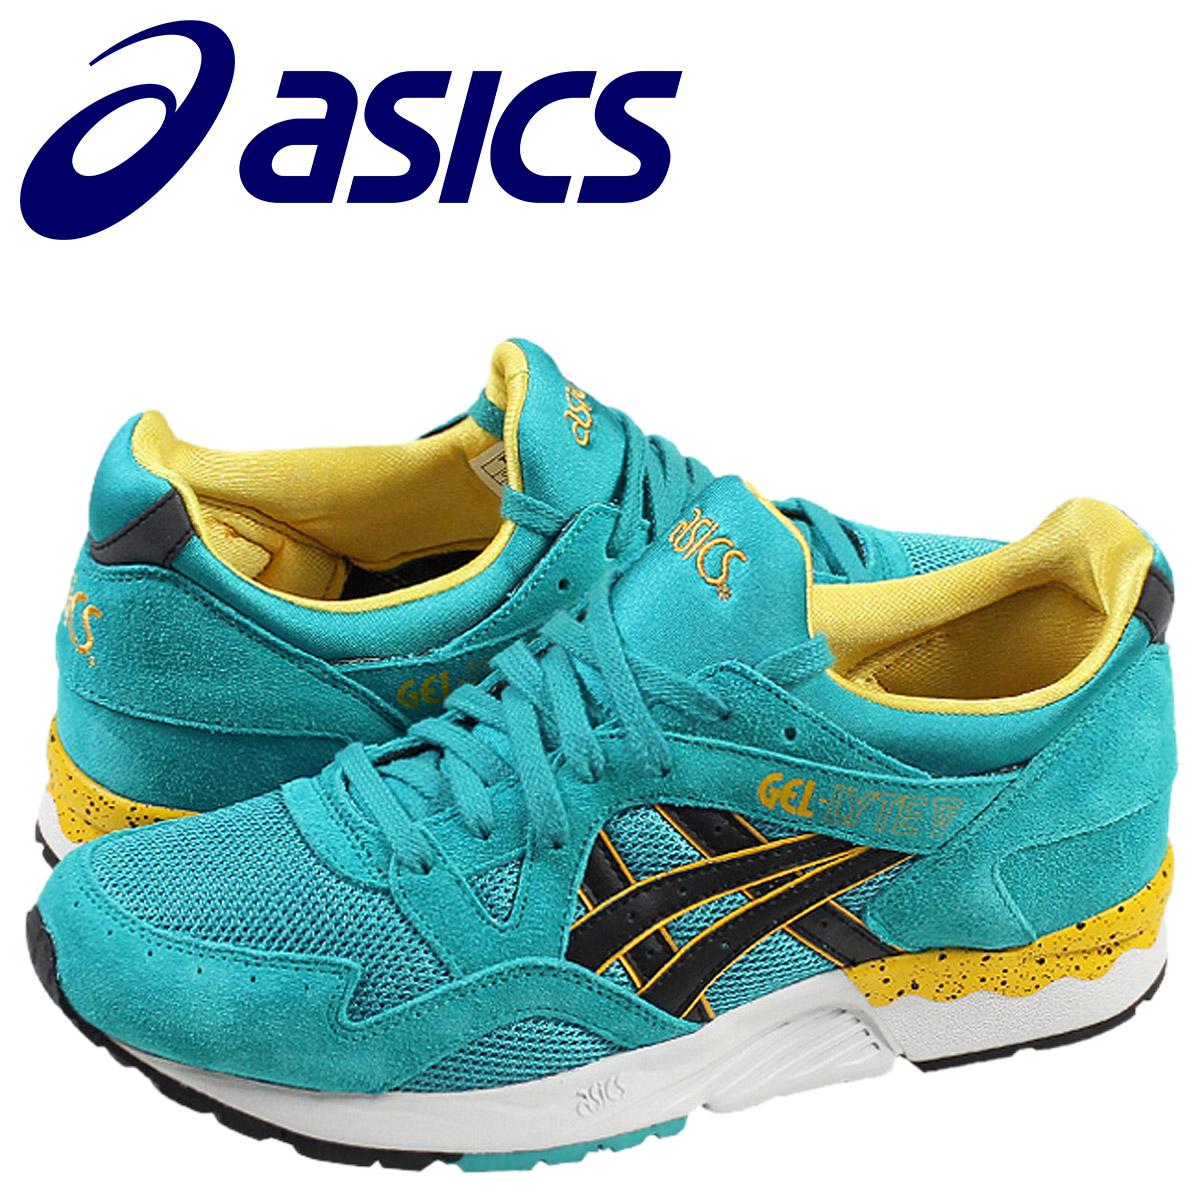 połowa ceny nowy design bardzo tanie asics ASICS gel light 5 sneakers GEL-LYTE 5 TH505L-7890 men shoes green